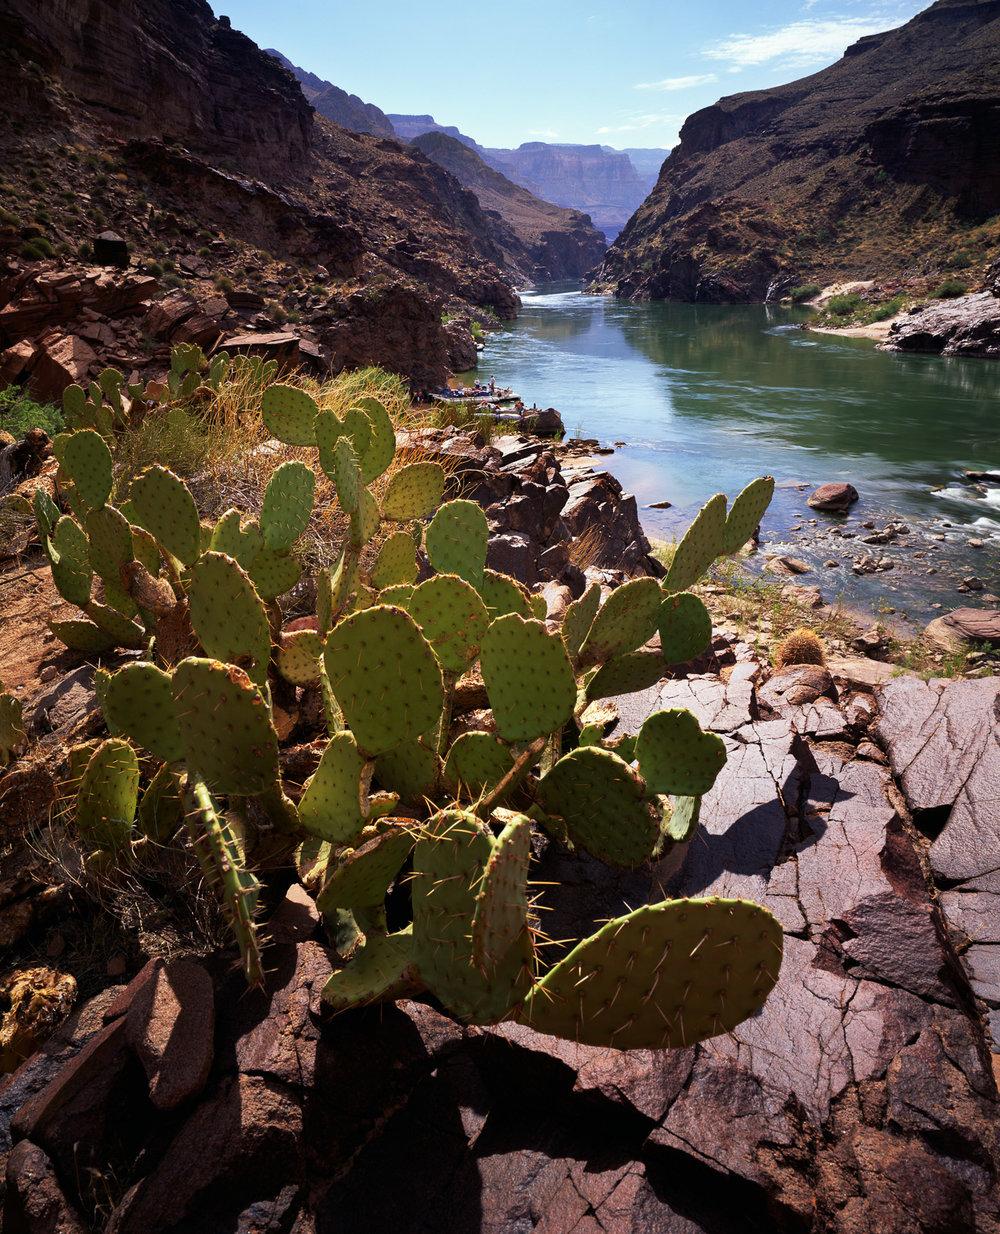 """Middle Granite Gorge at Deer Creek, Colorado River Grand Canyon NP, Kaibab NF  ARIZONA"""